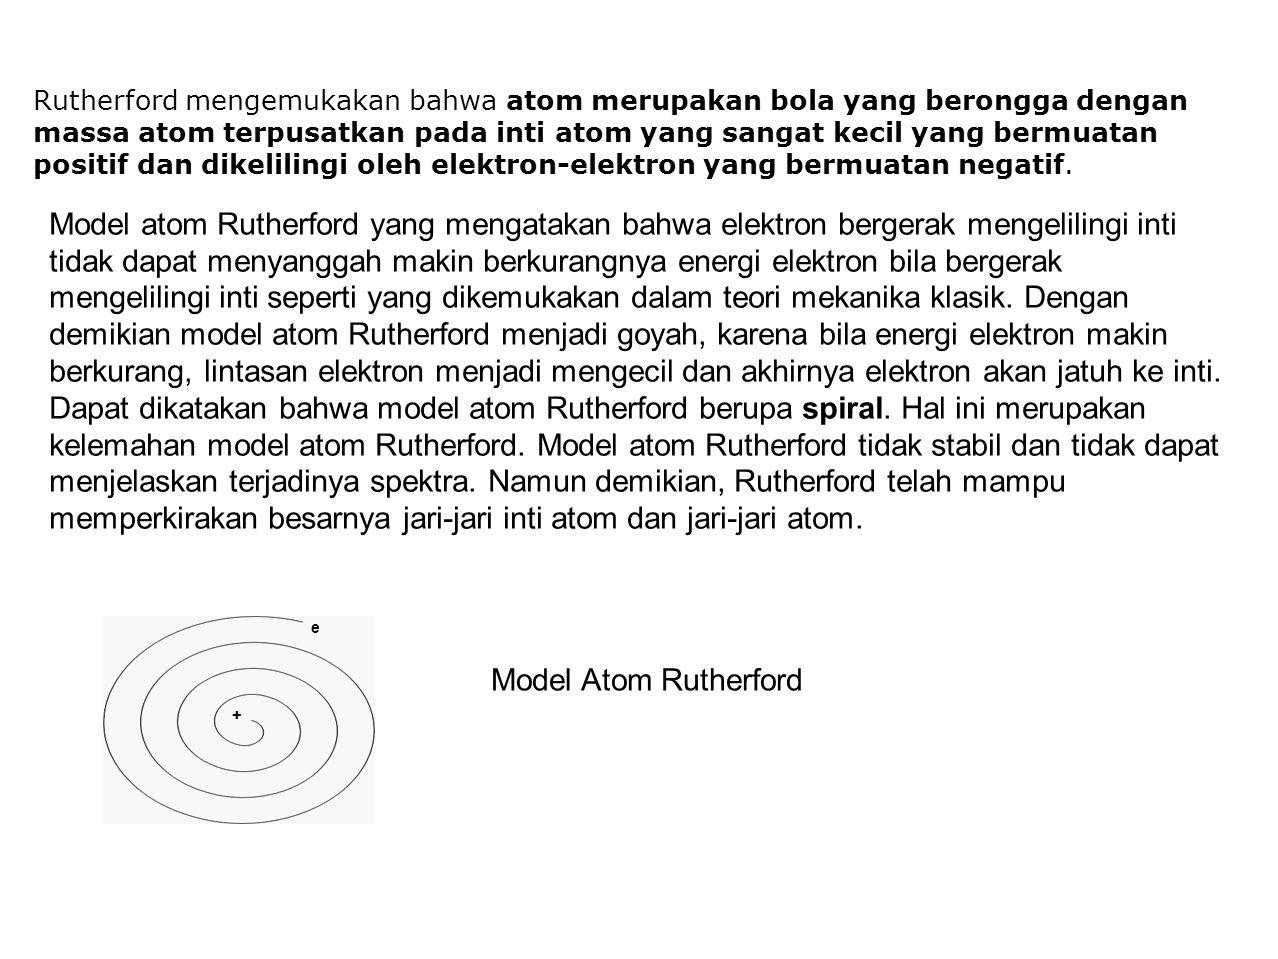 Rutherford mengemukakan bahwa atom merupakan bola yang berongga dengan massa atom terpusatkan pada inti atom yang sangat kecil yang bermuatan positif dan dikelilingi oleh elektron-elektron yang bermuatan negatif.